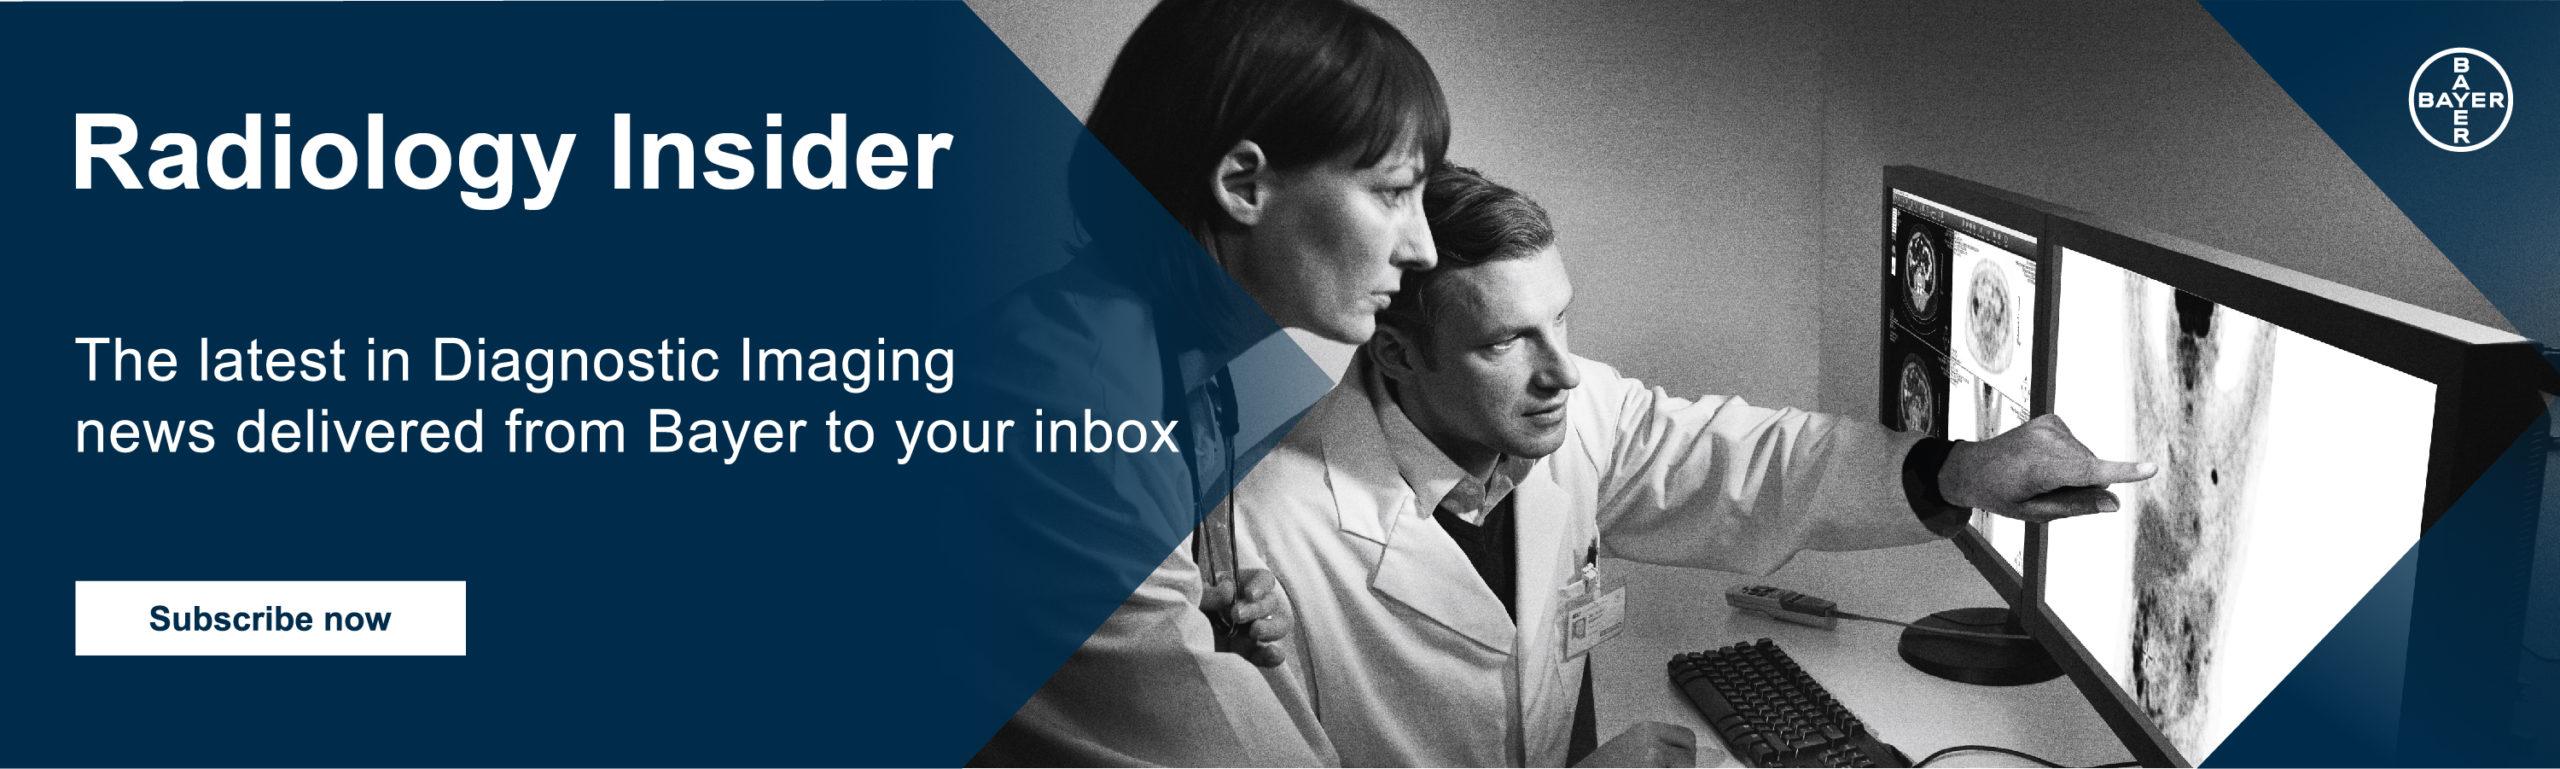 Bayer's Radiology Insider